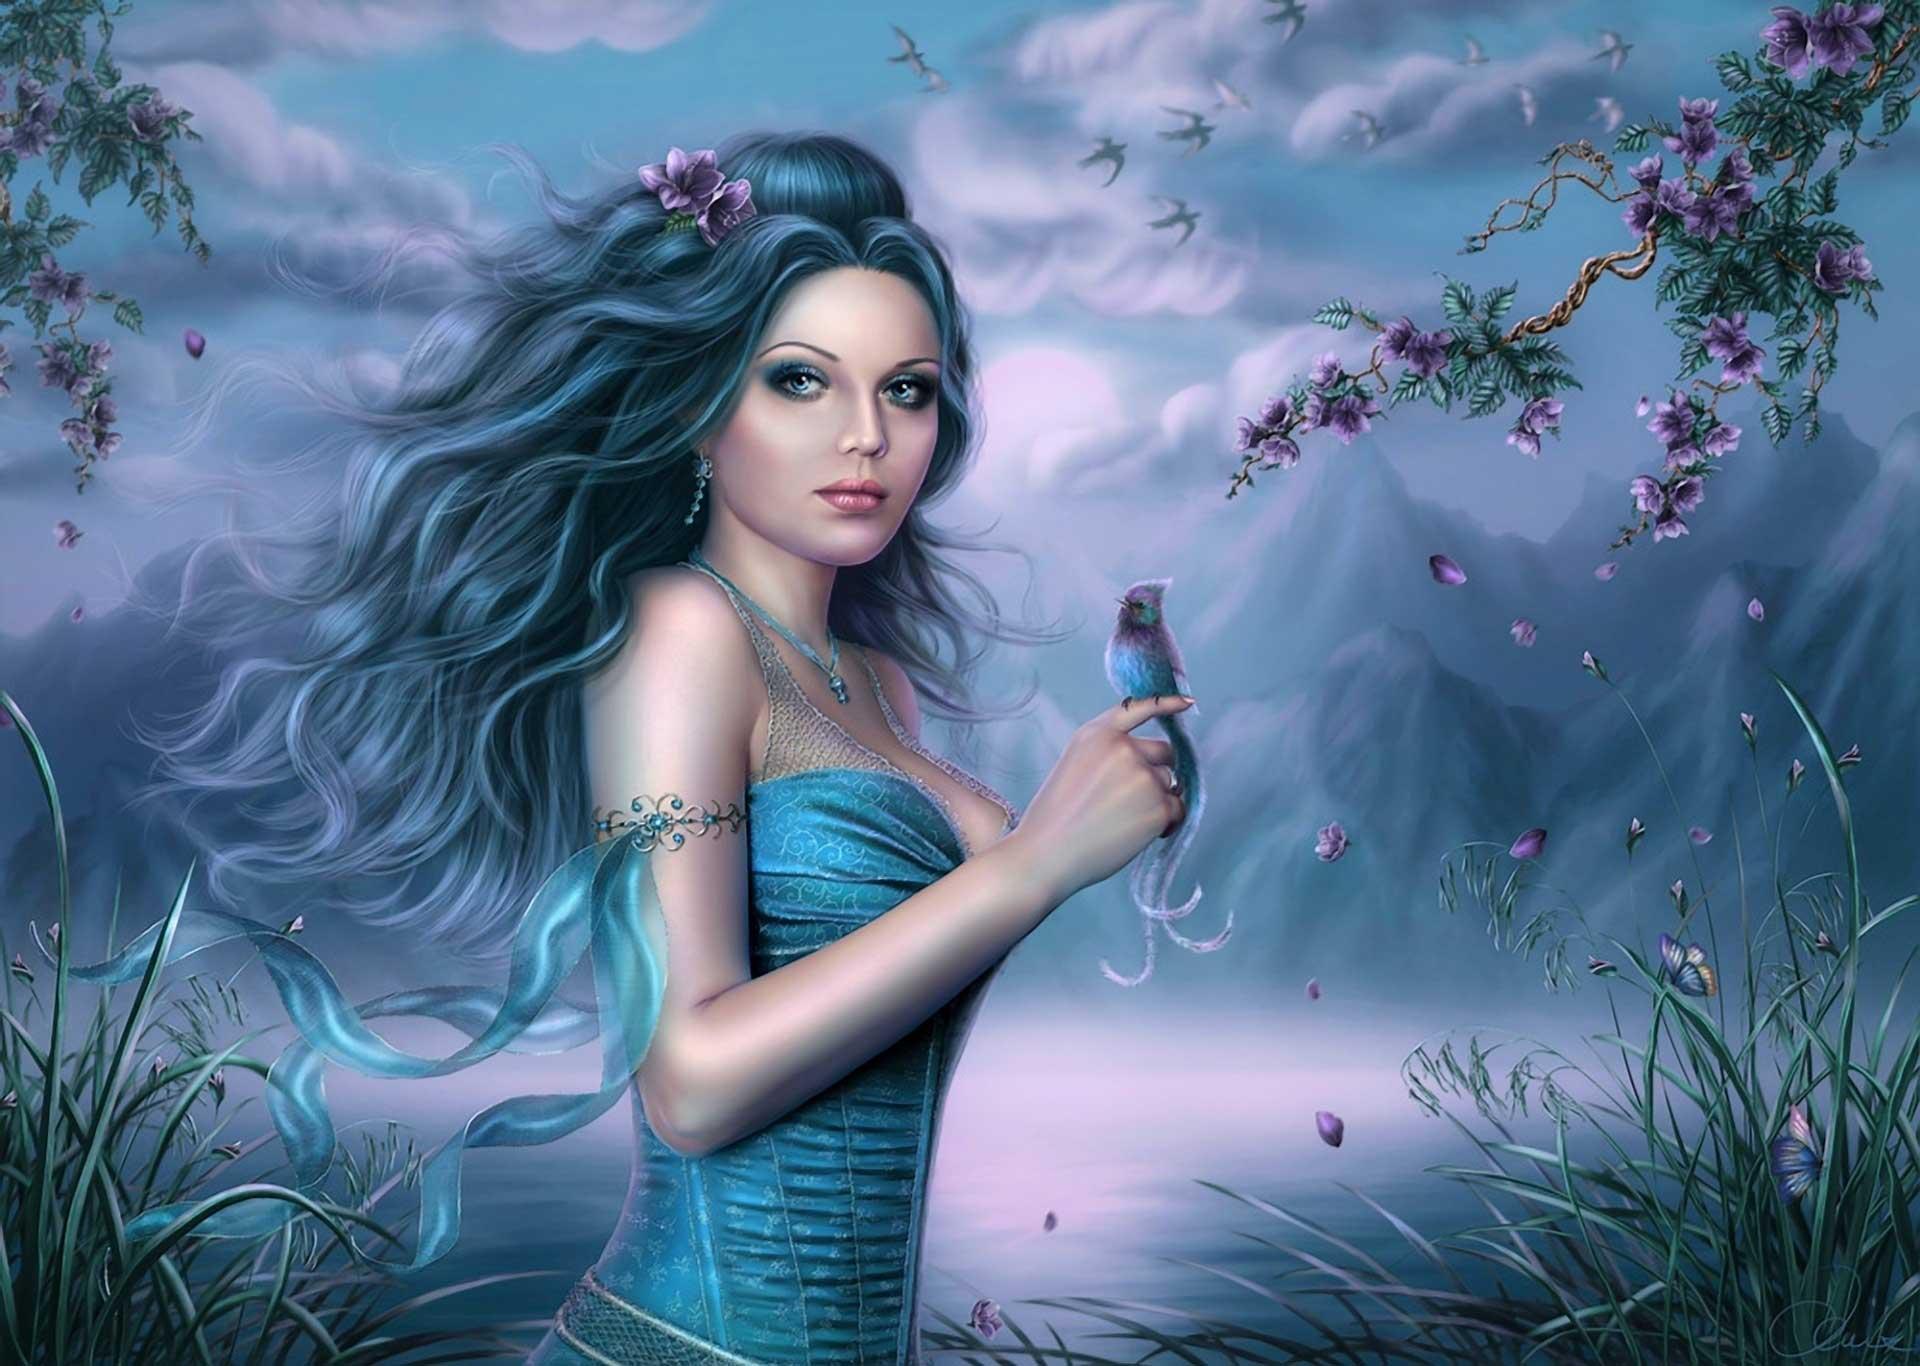 fantasy girl hd desktop wallpaper : widescreen : high definition